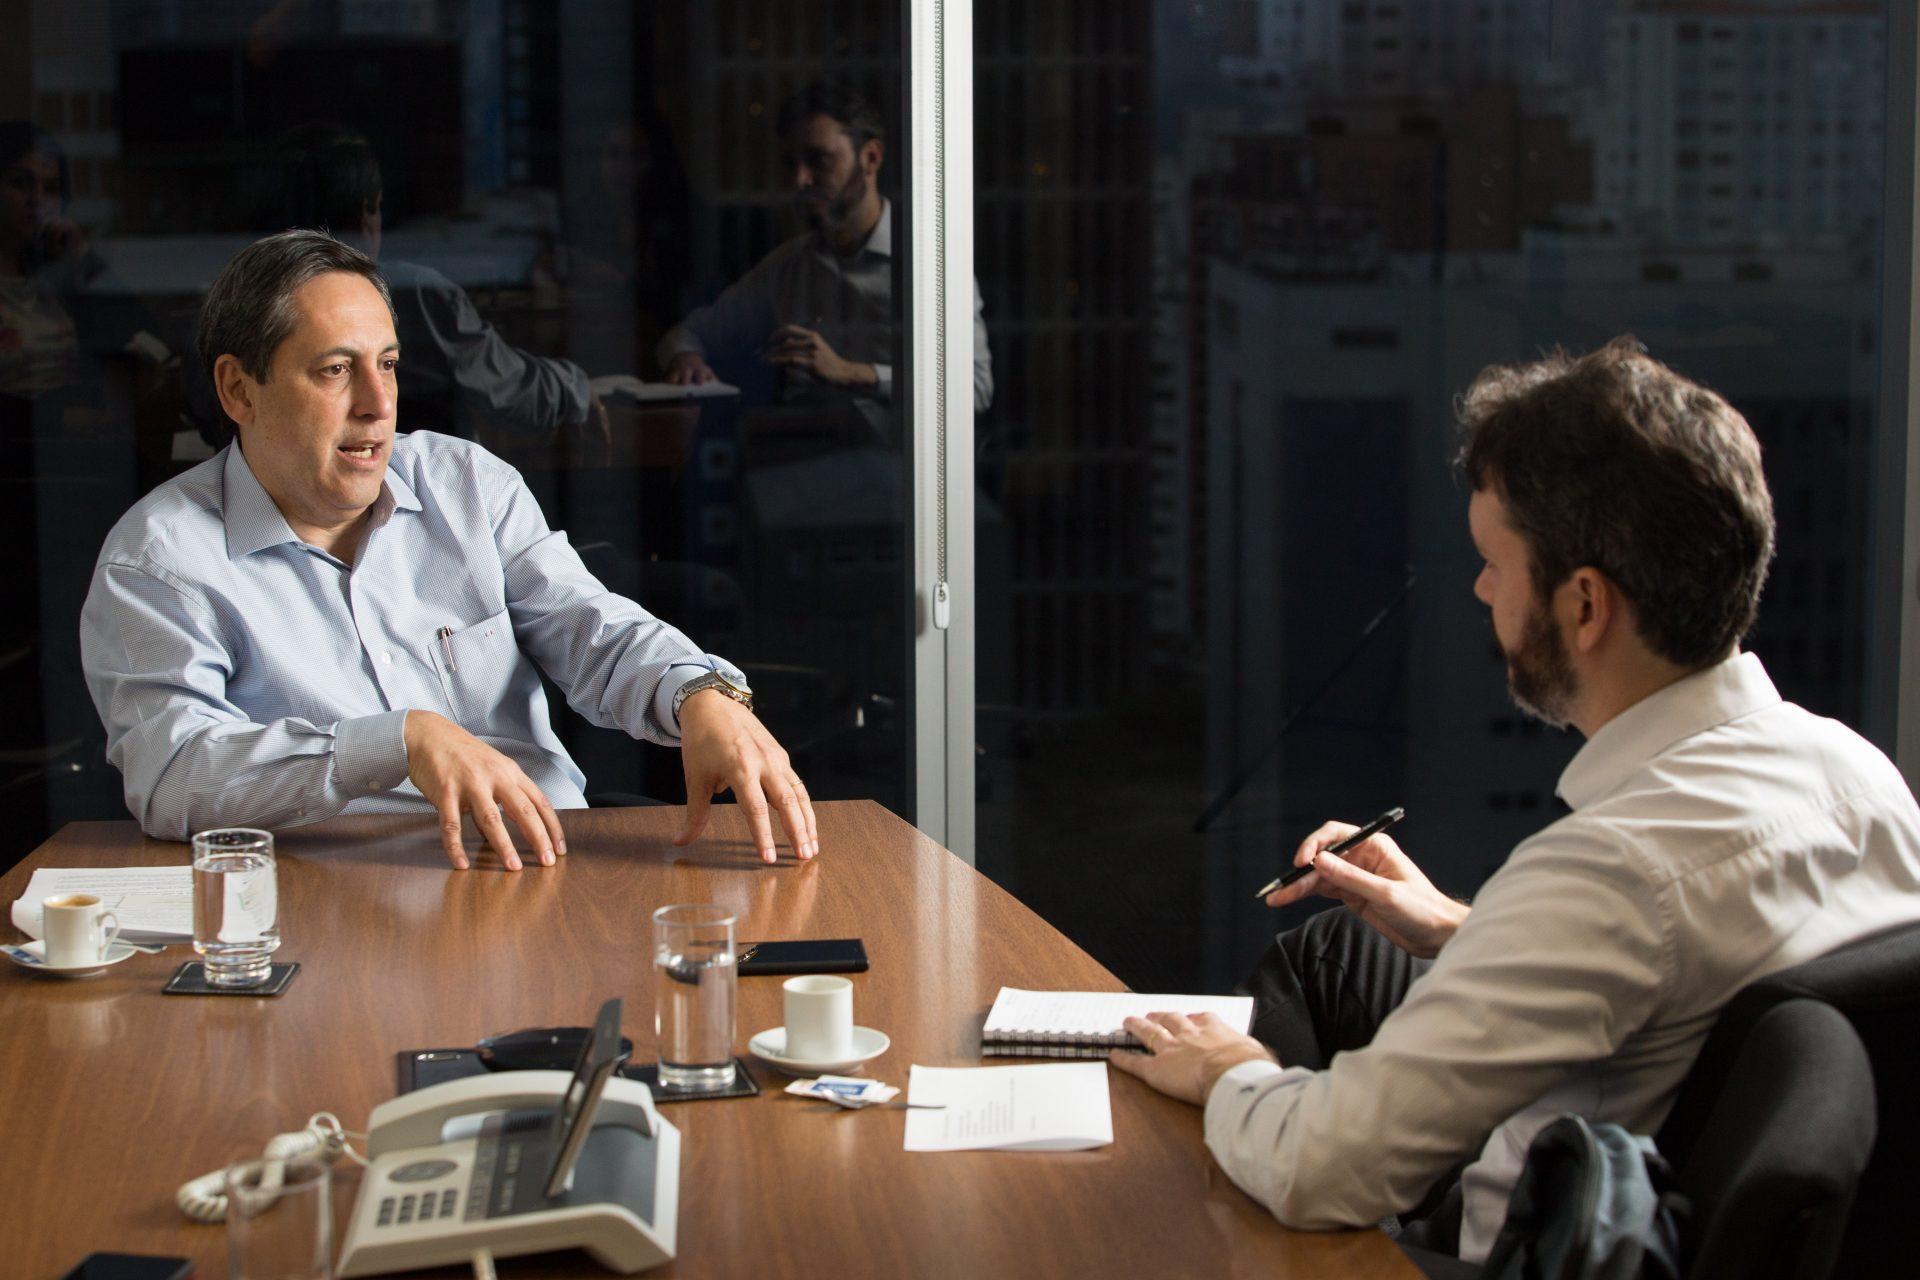 Presidente do Banco Pan Luiz Francisco Monteiro de Barros Neto, e Vinícius Pinheiro